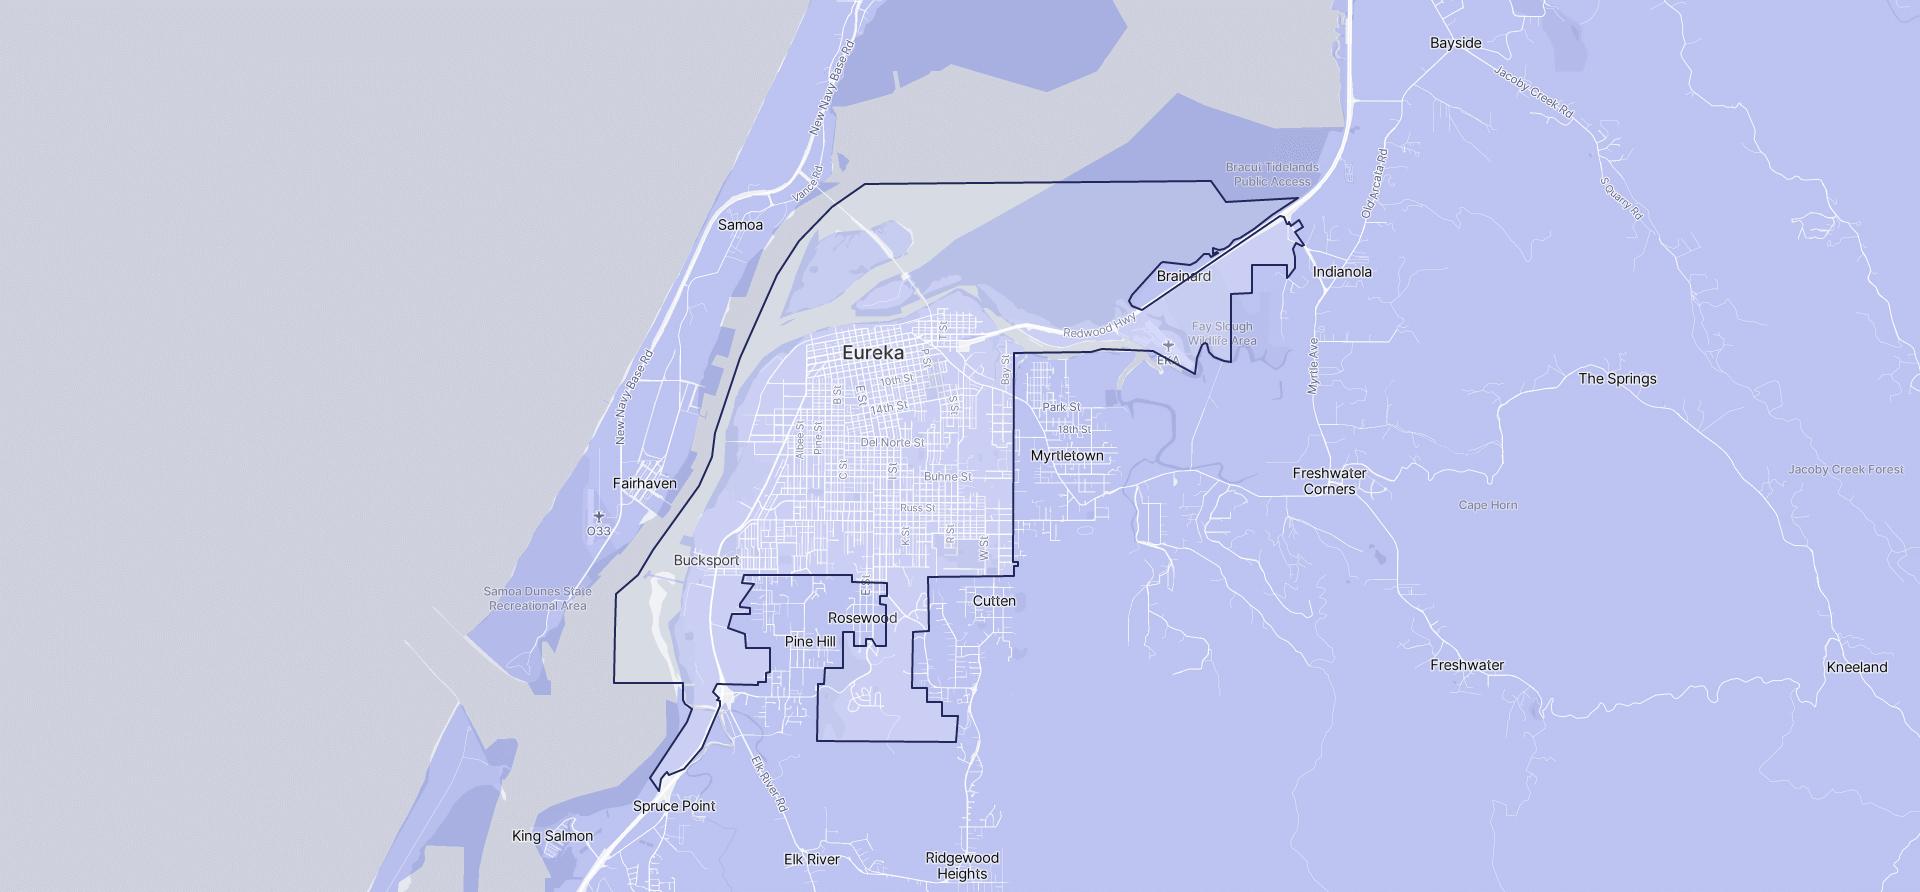 Image of Eureka boundaries on a map.